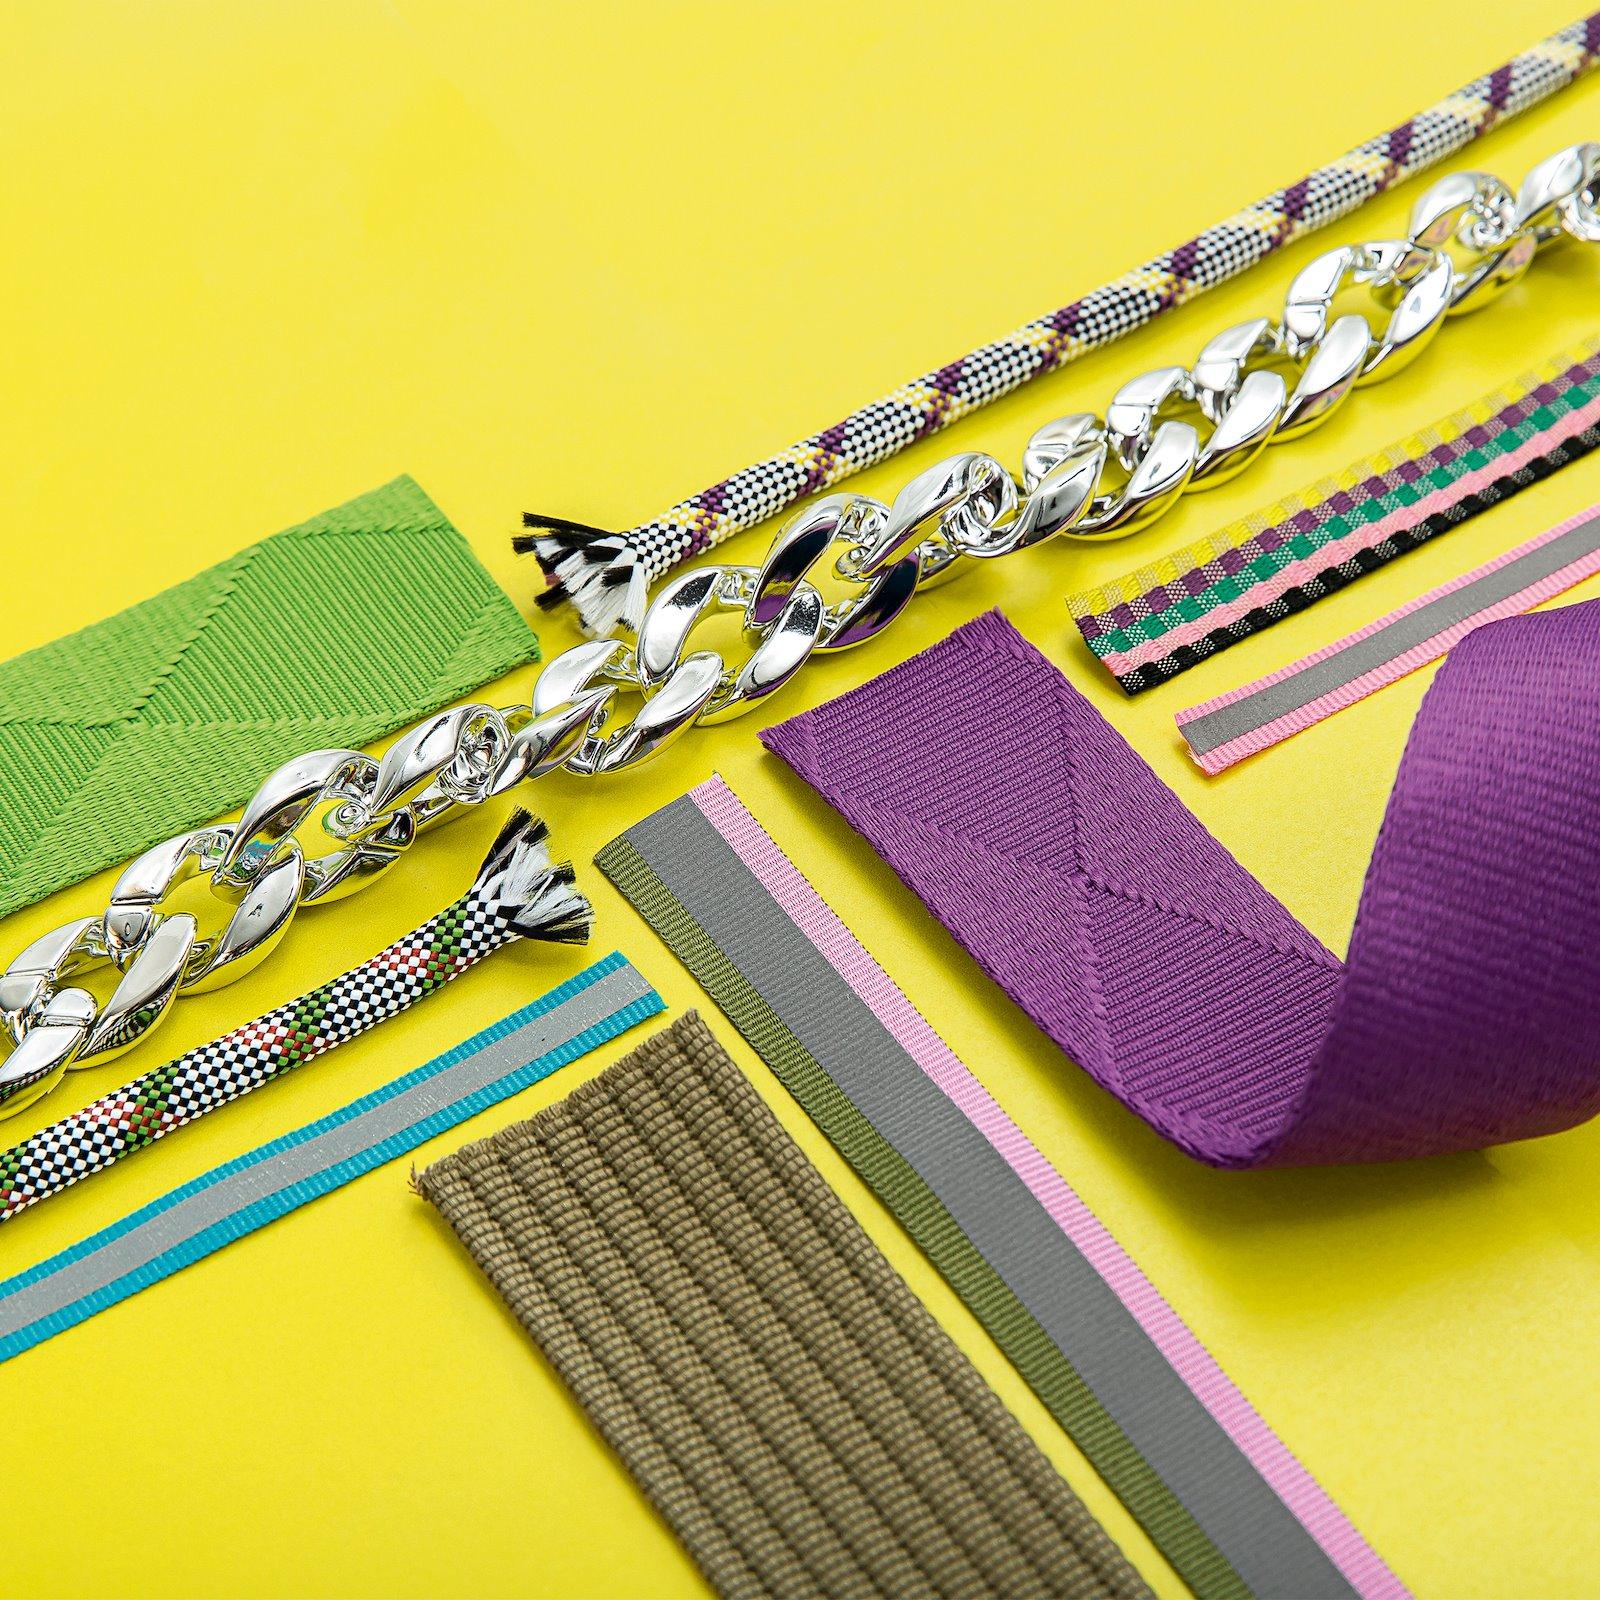 Ribbon woven squares 38mm purple 2m 22292_22276_38100_22394_22201_22293_22200_22405_22202_22277_bundle